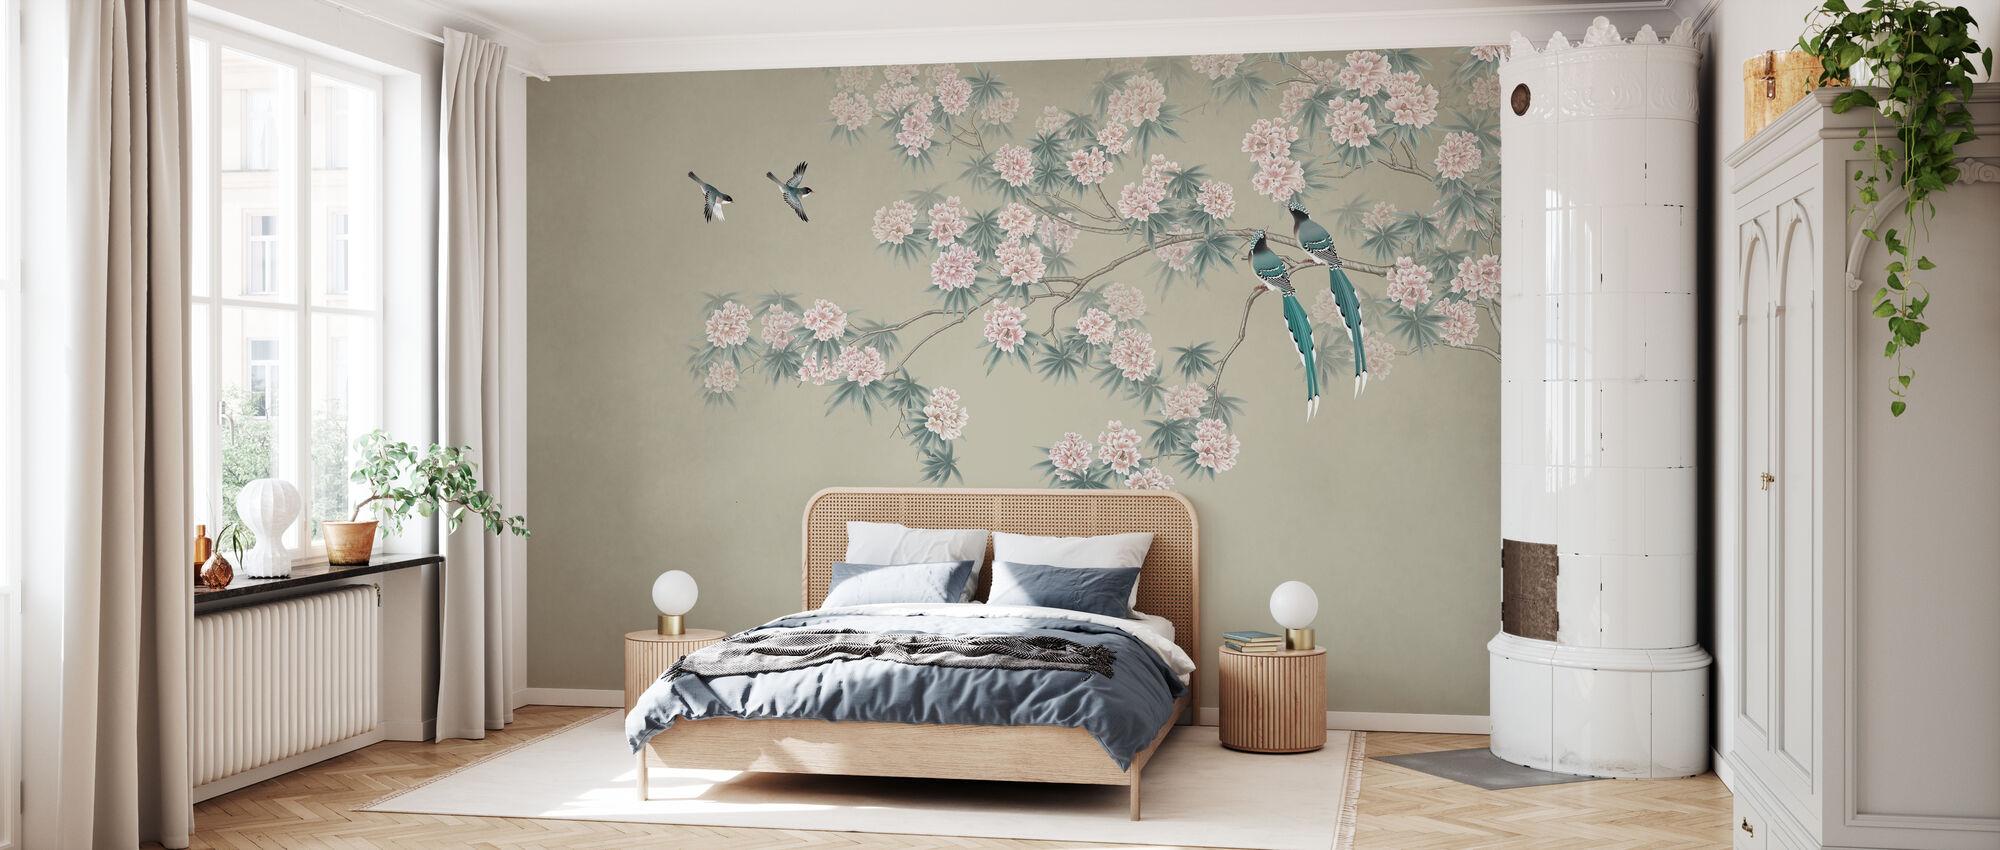 Bird Branch - Hazel - Wallpaper - Bedroom